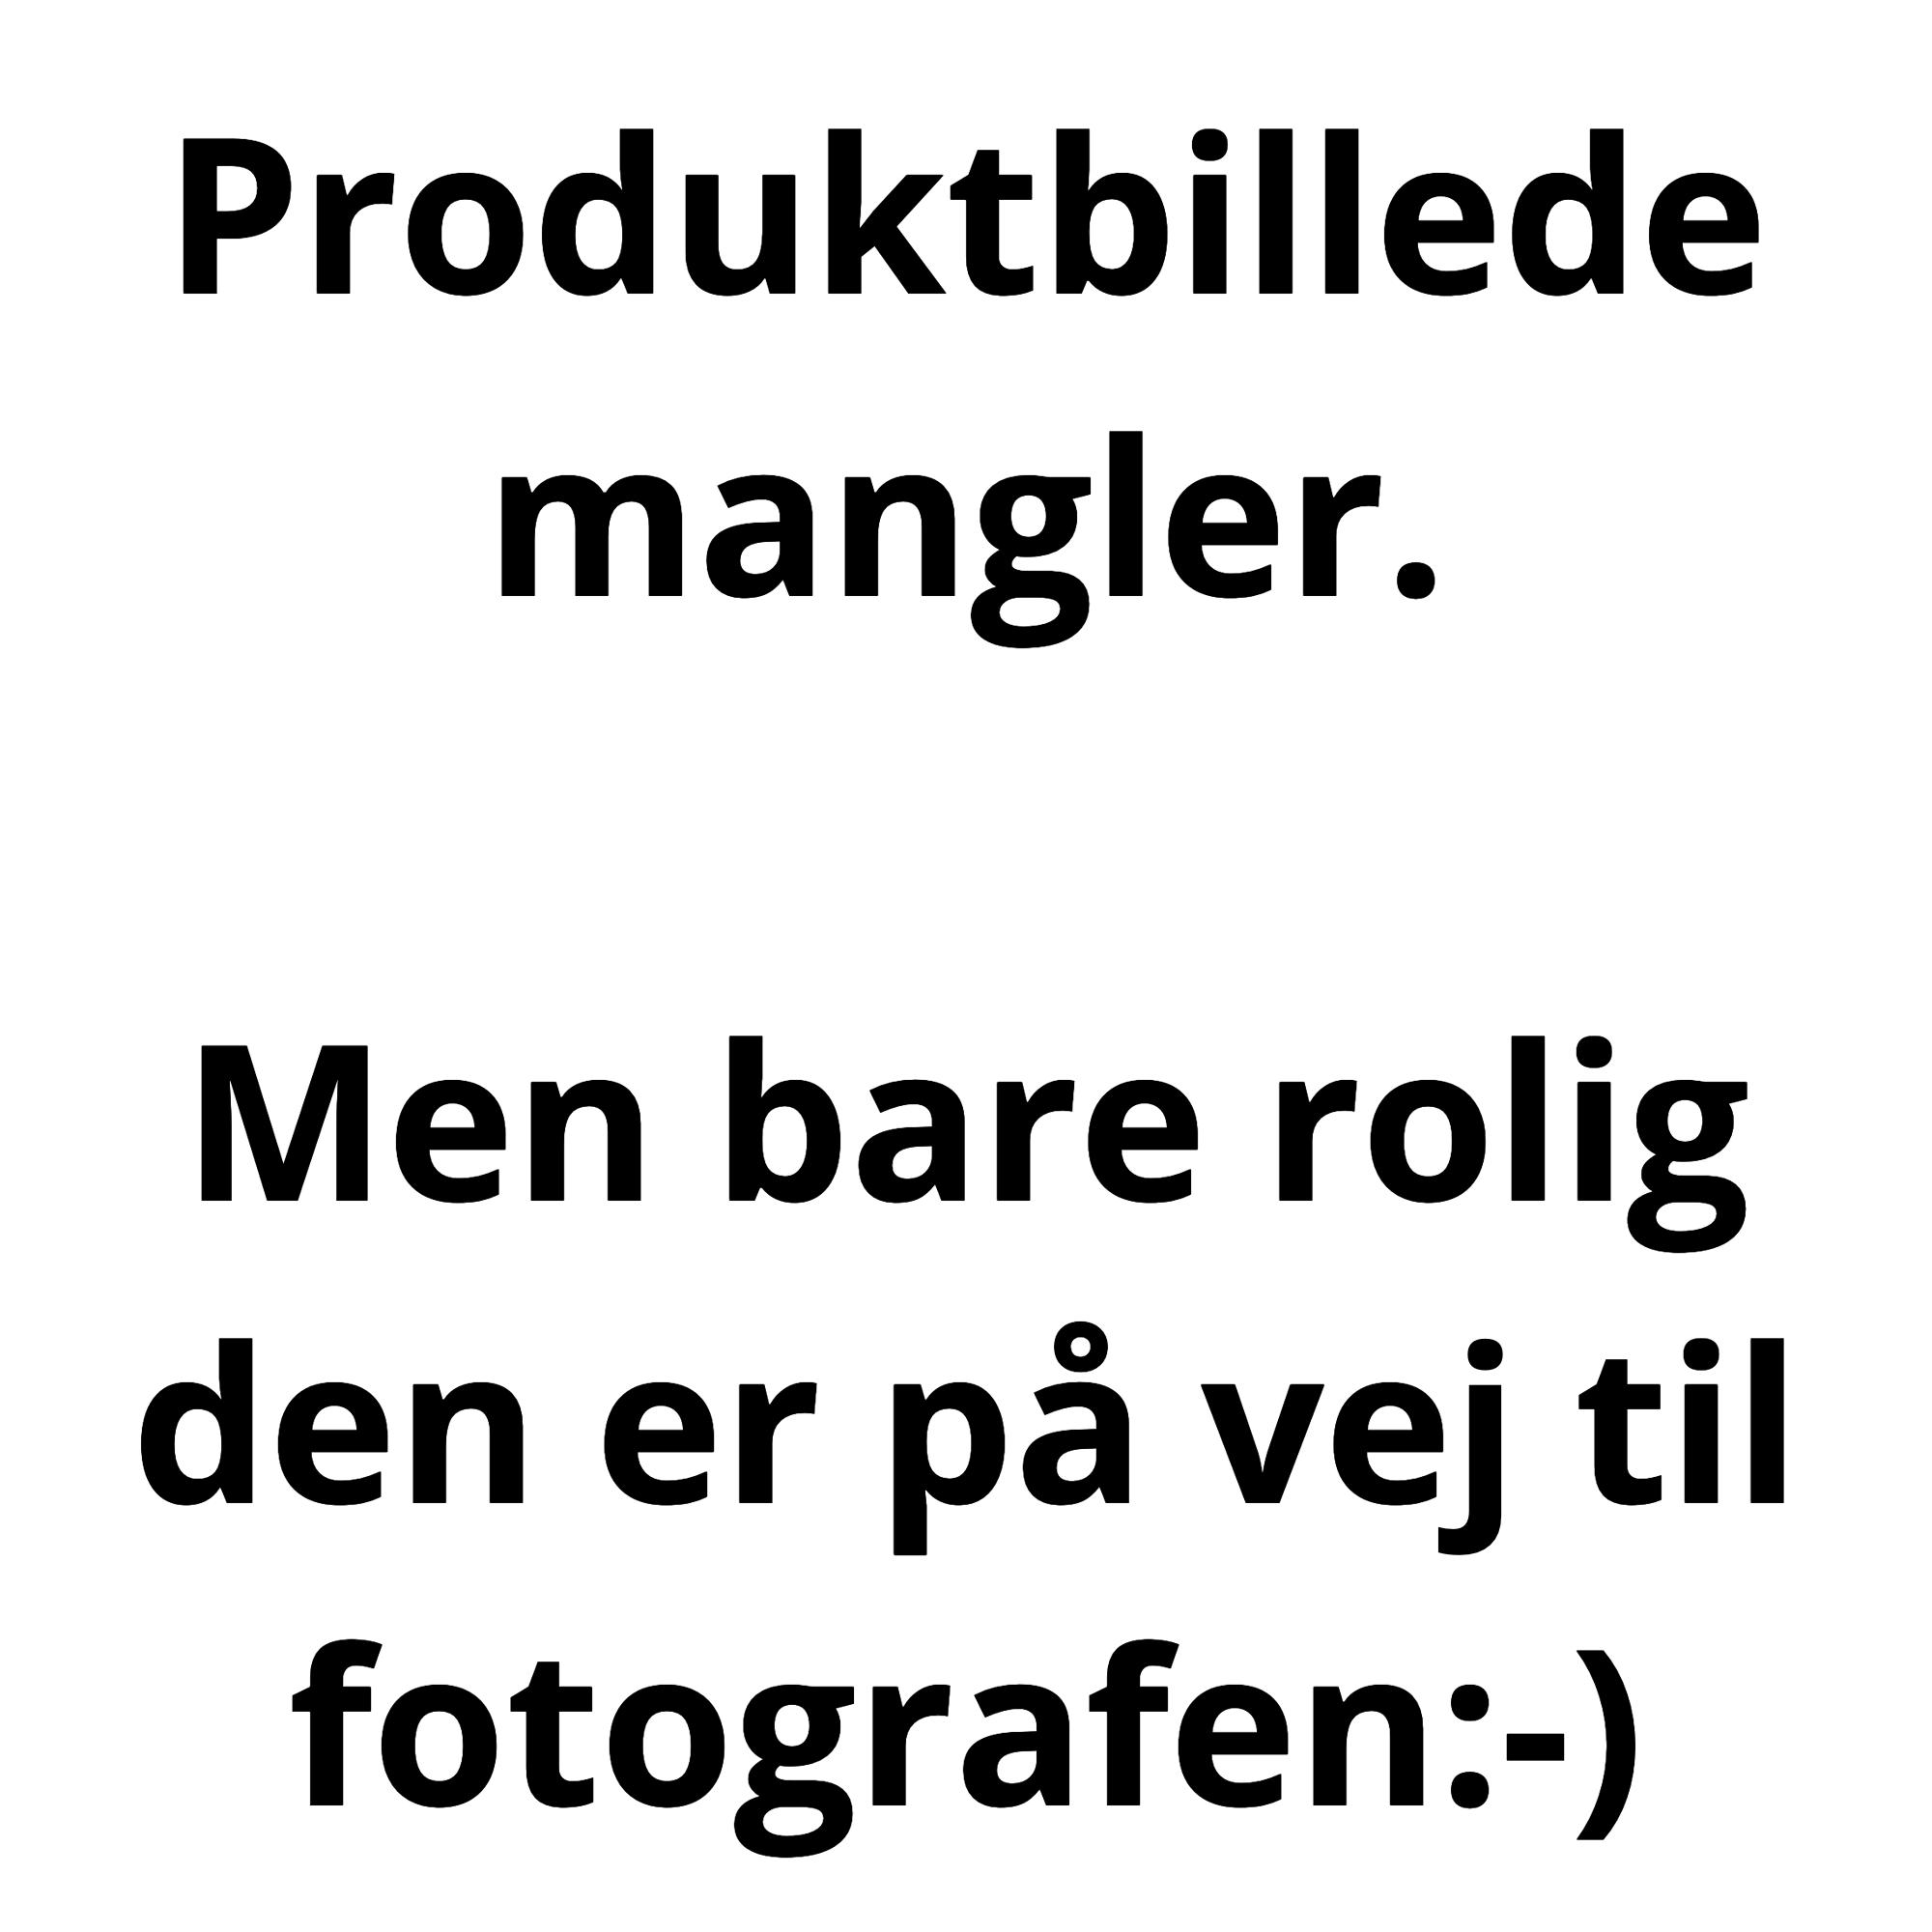 Brodit Apple iPhone 5/5S/5C/SE/12 Mini Justerbar holder 62-77mm - Aktiv holder